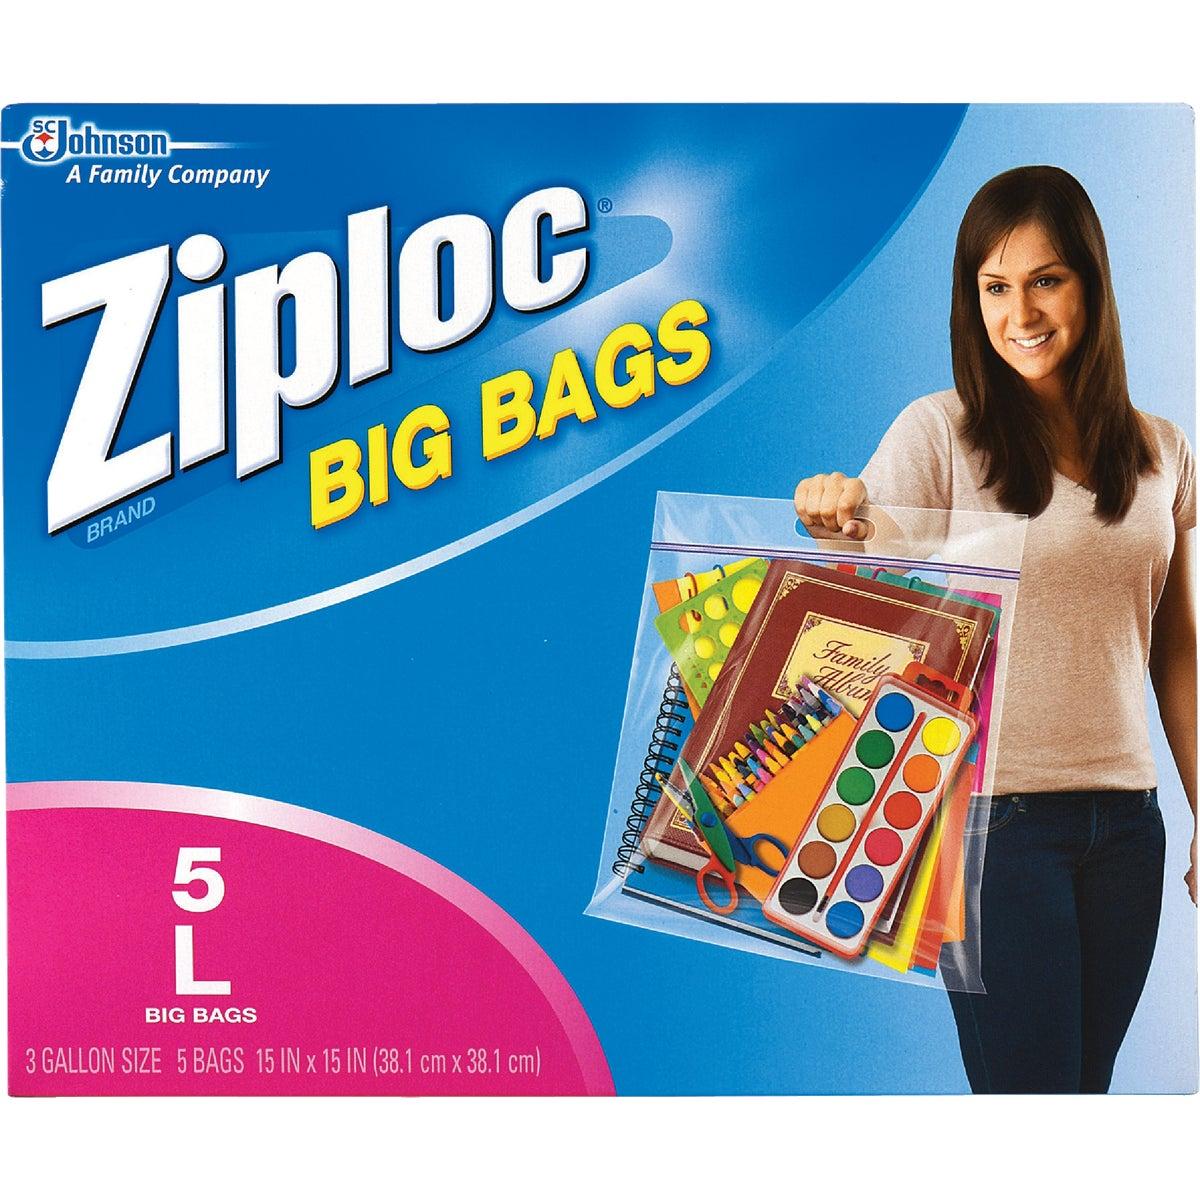 LARGE ZIPLOC BIG BAGS